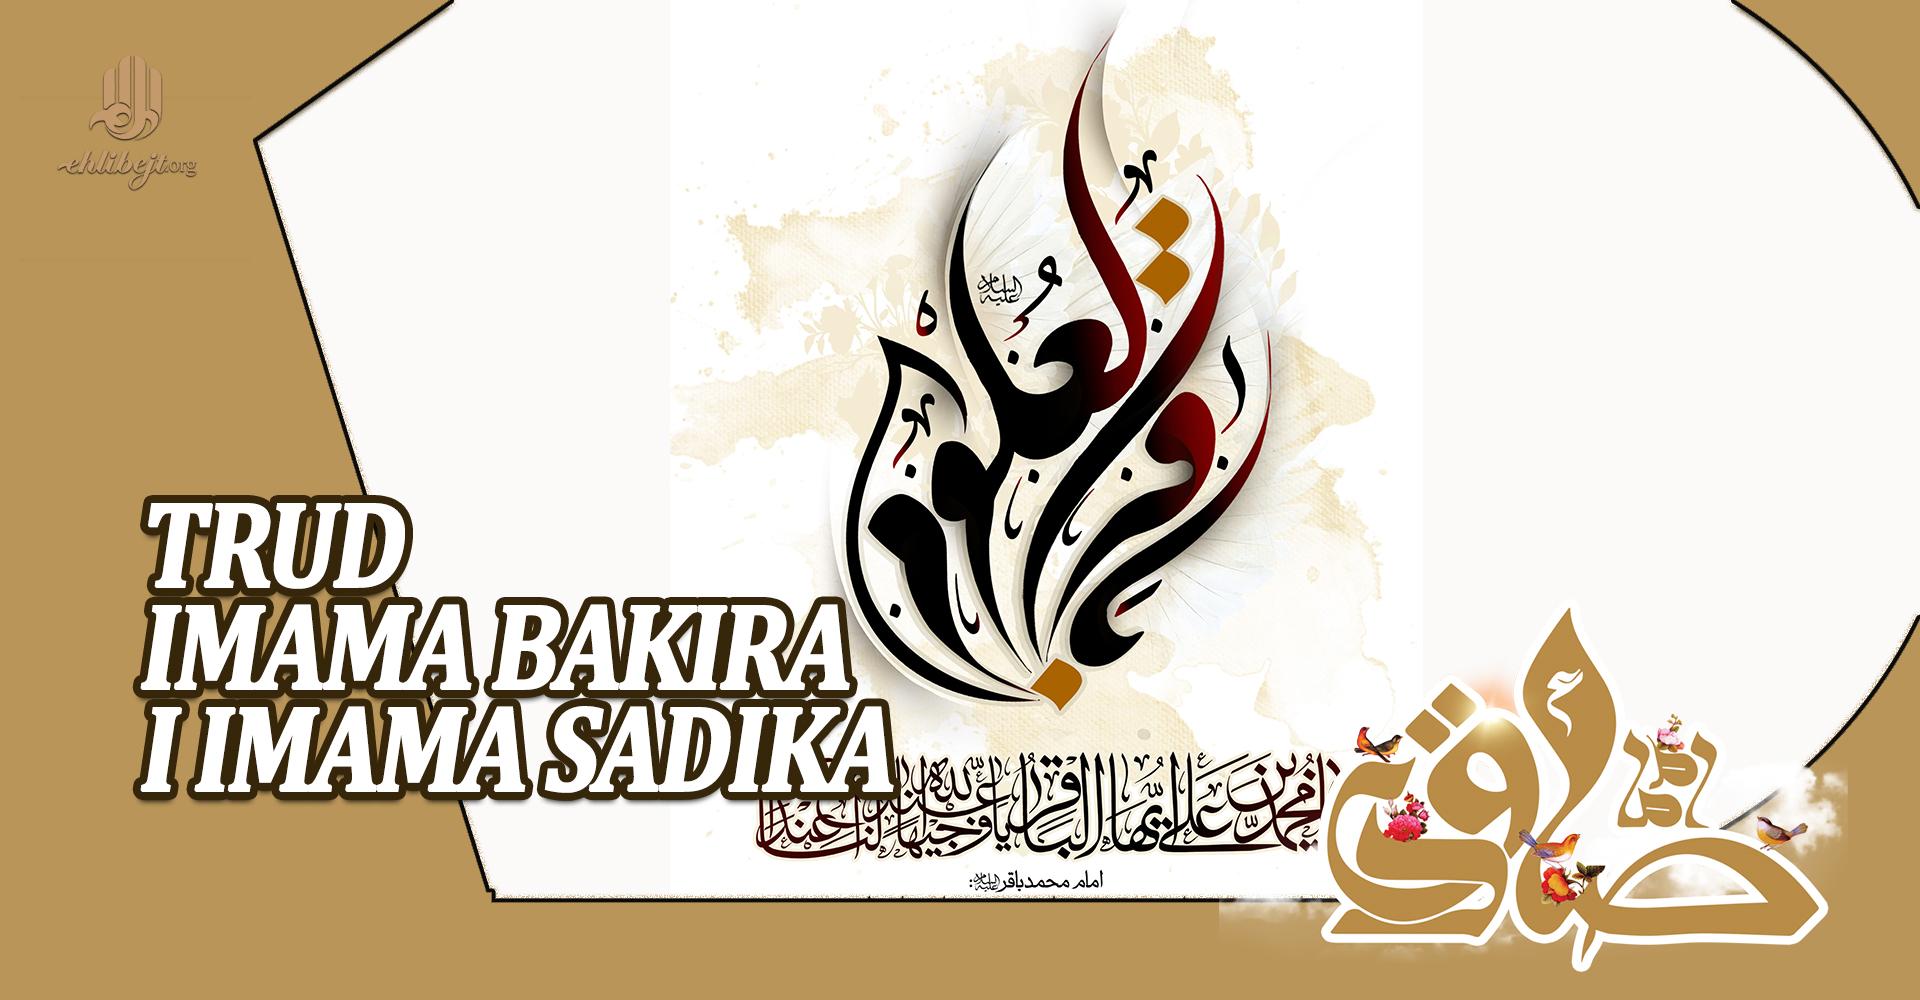 Trud Imama Bakira i Imama Sadika, a.s.